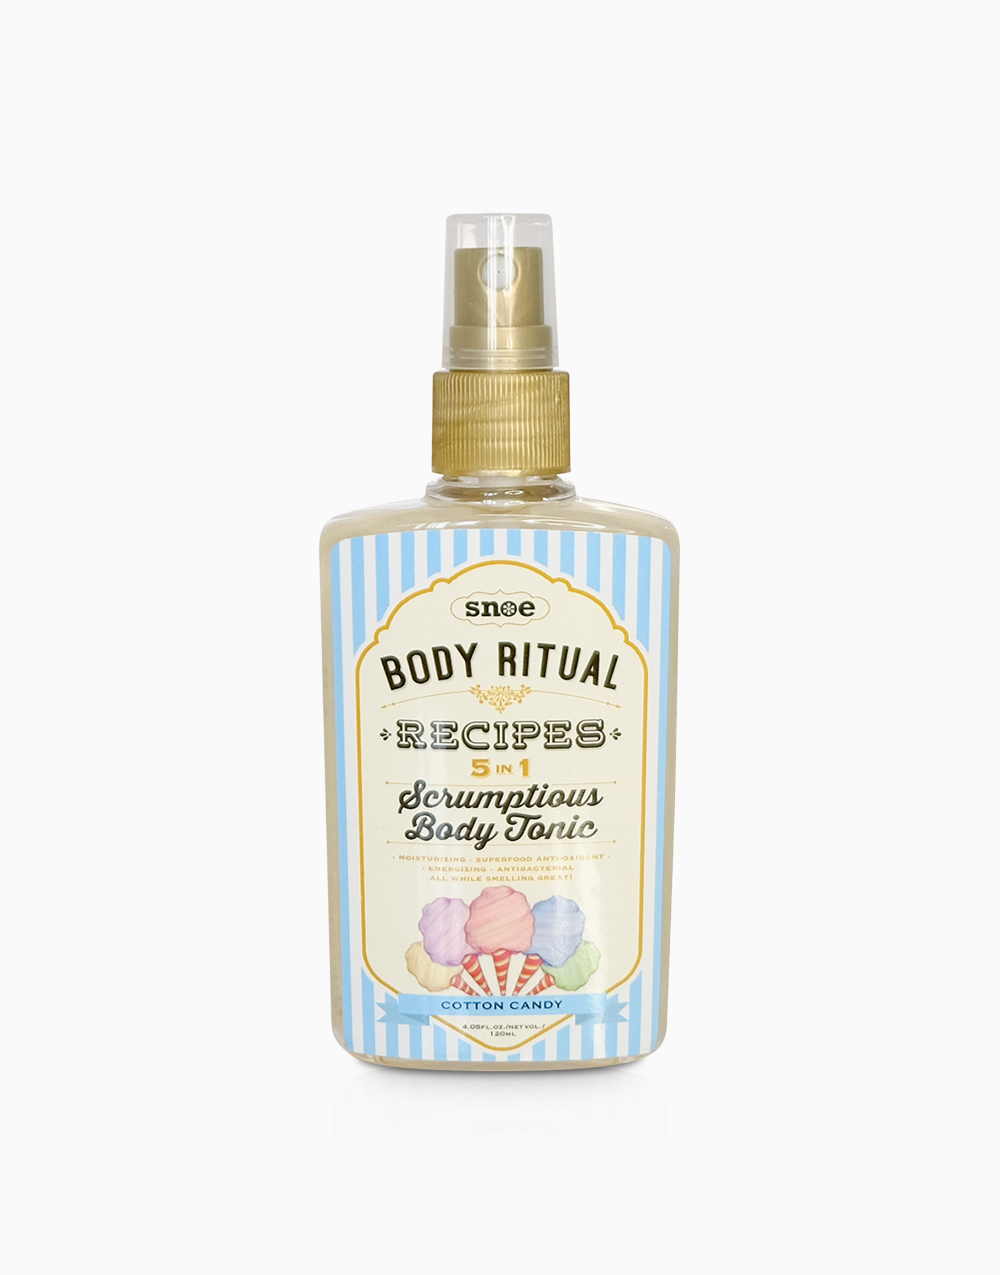 Body Ritual Recipes Scrumptious Body Tonic (Cotton Candy) by Snoe Beauty